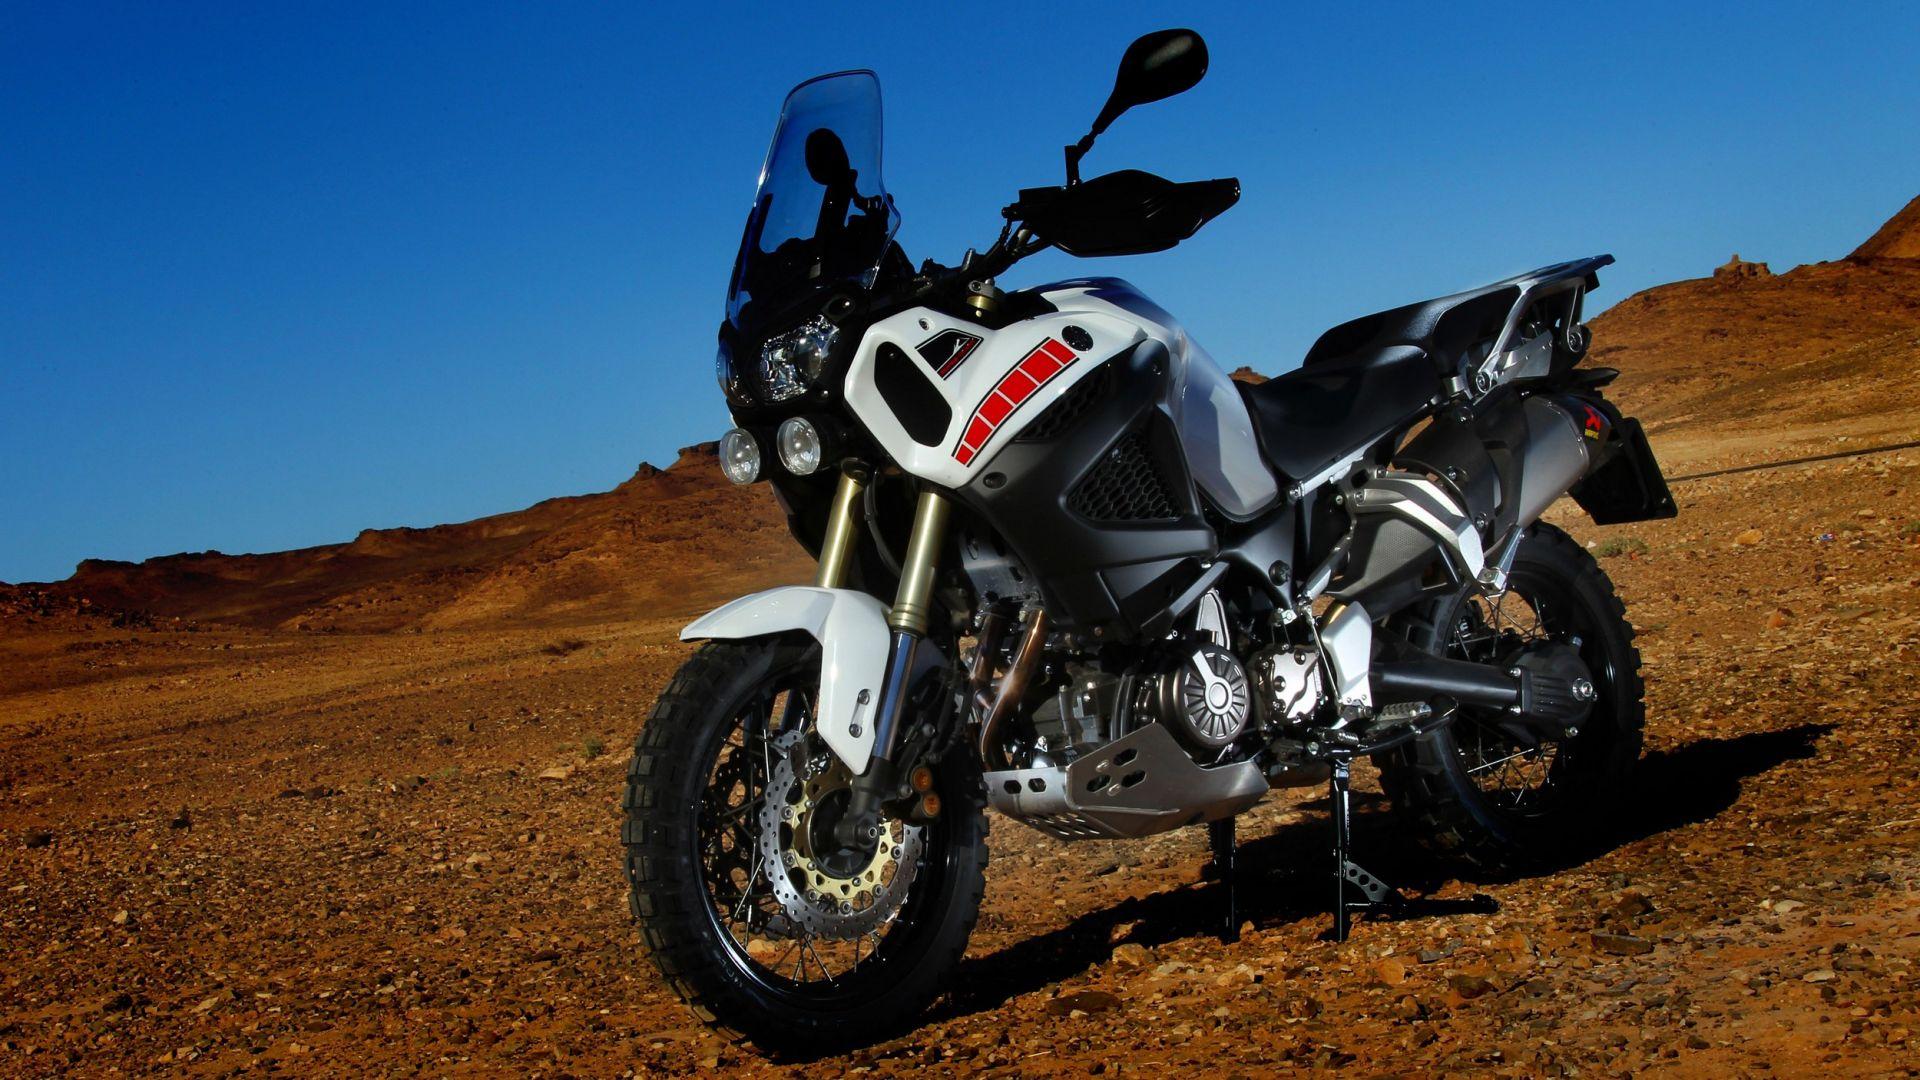 Immagine 55: In Marocco con la Yamaha Super Ténéré